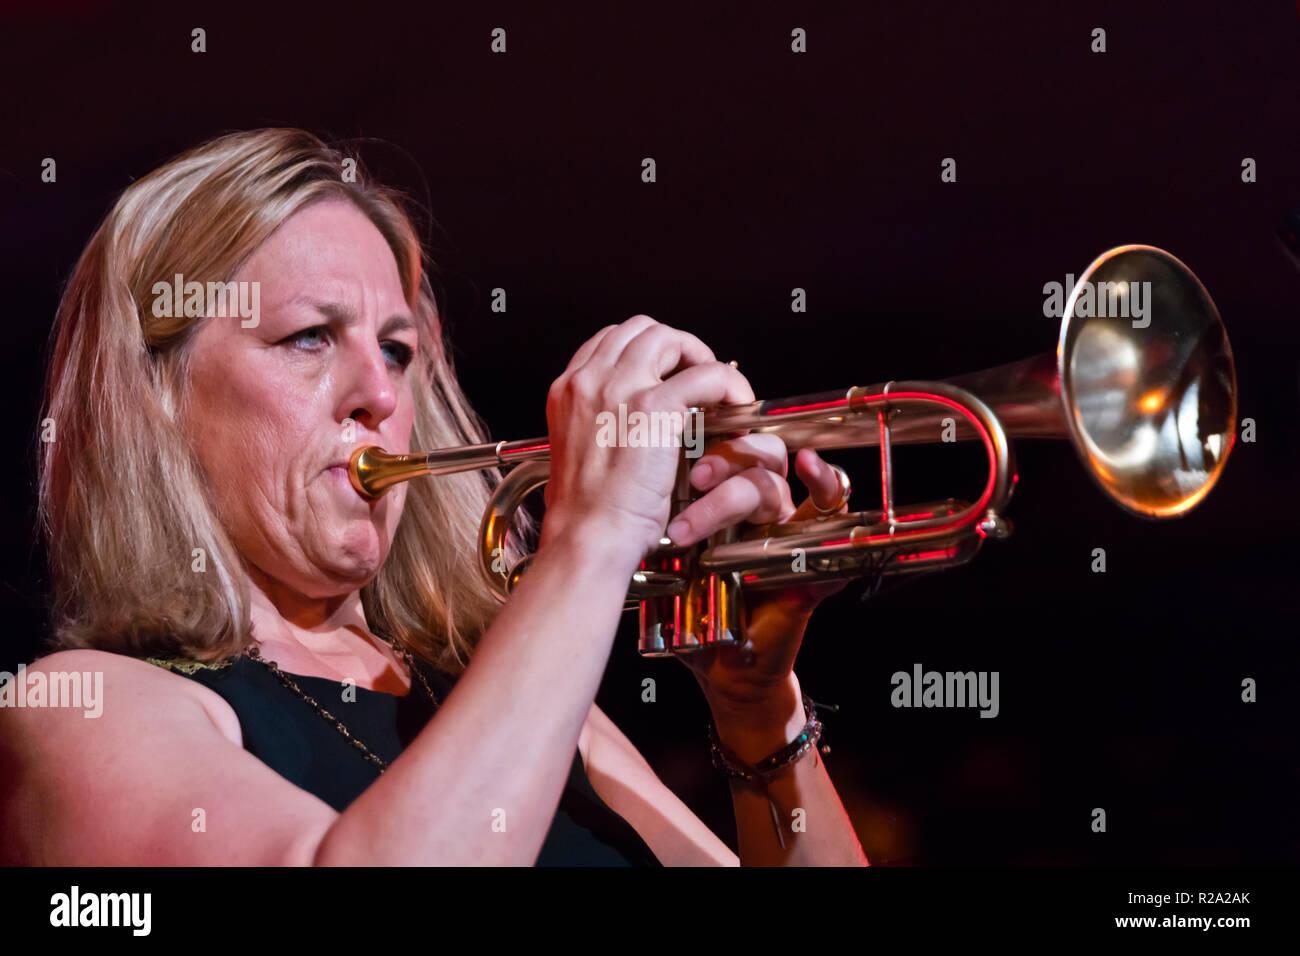 INGRID & CHRISTINE JENSEN INFINITUDE perform at the 61st Monterey Jazz Festival - MONTEREY, CALIFORNIA - Stock Image